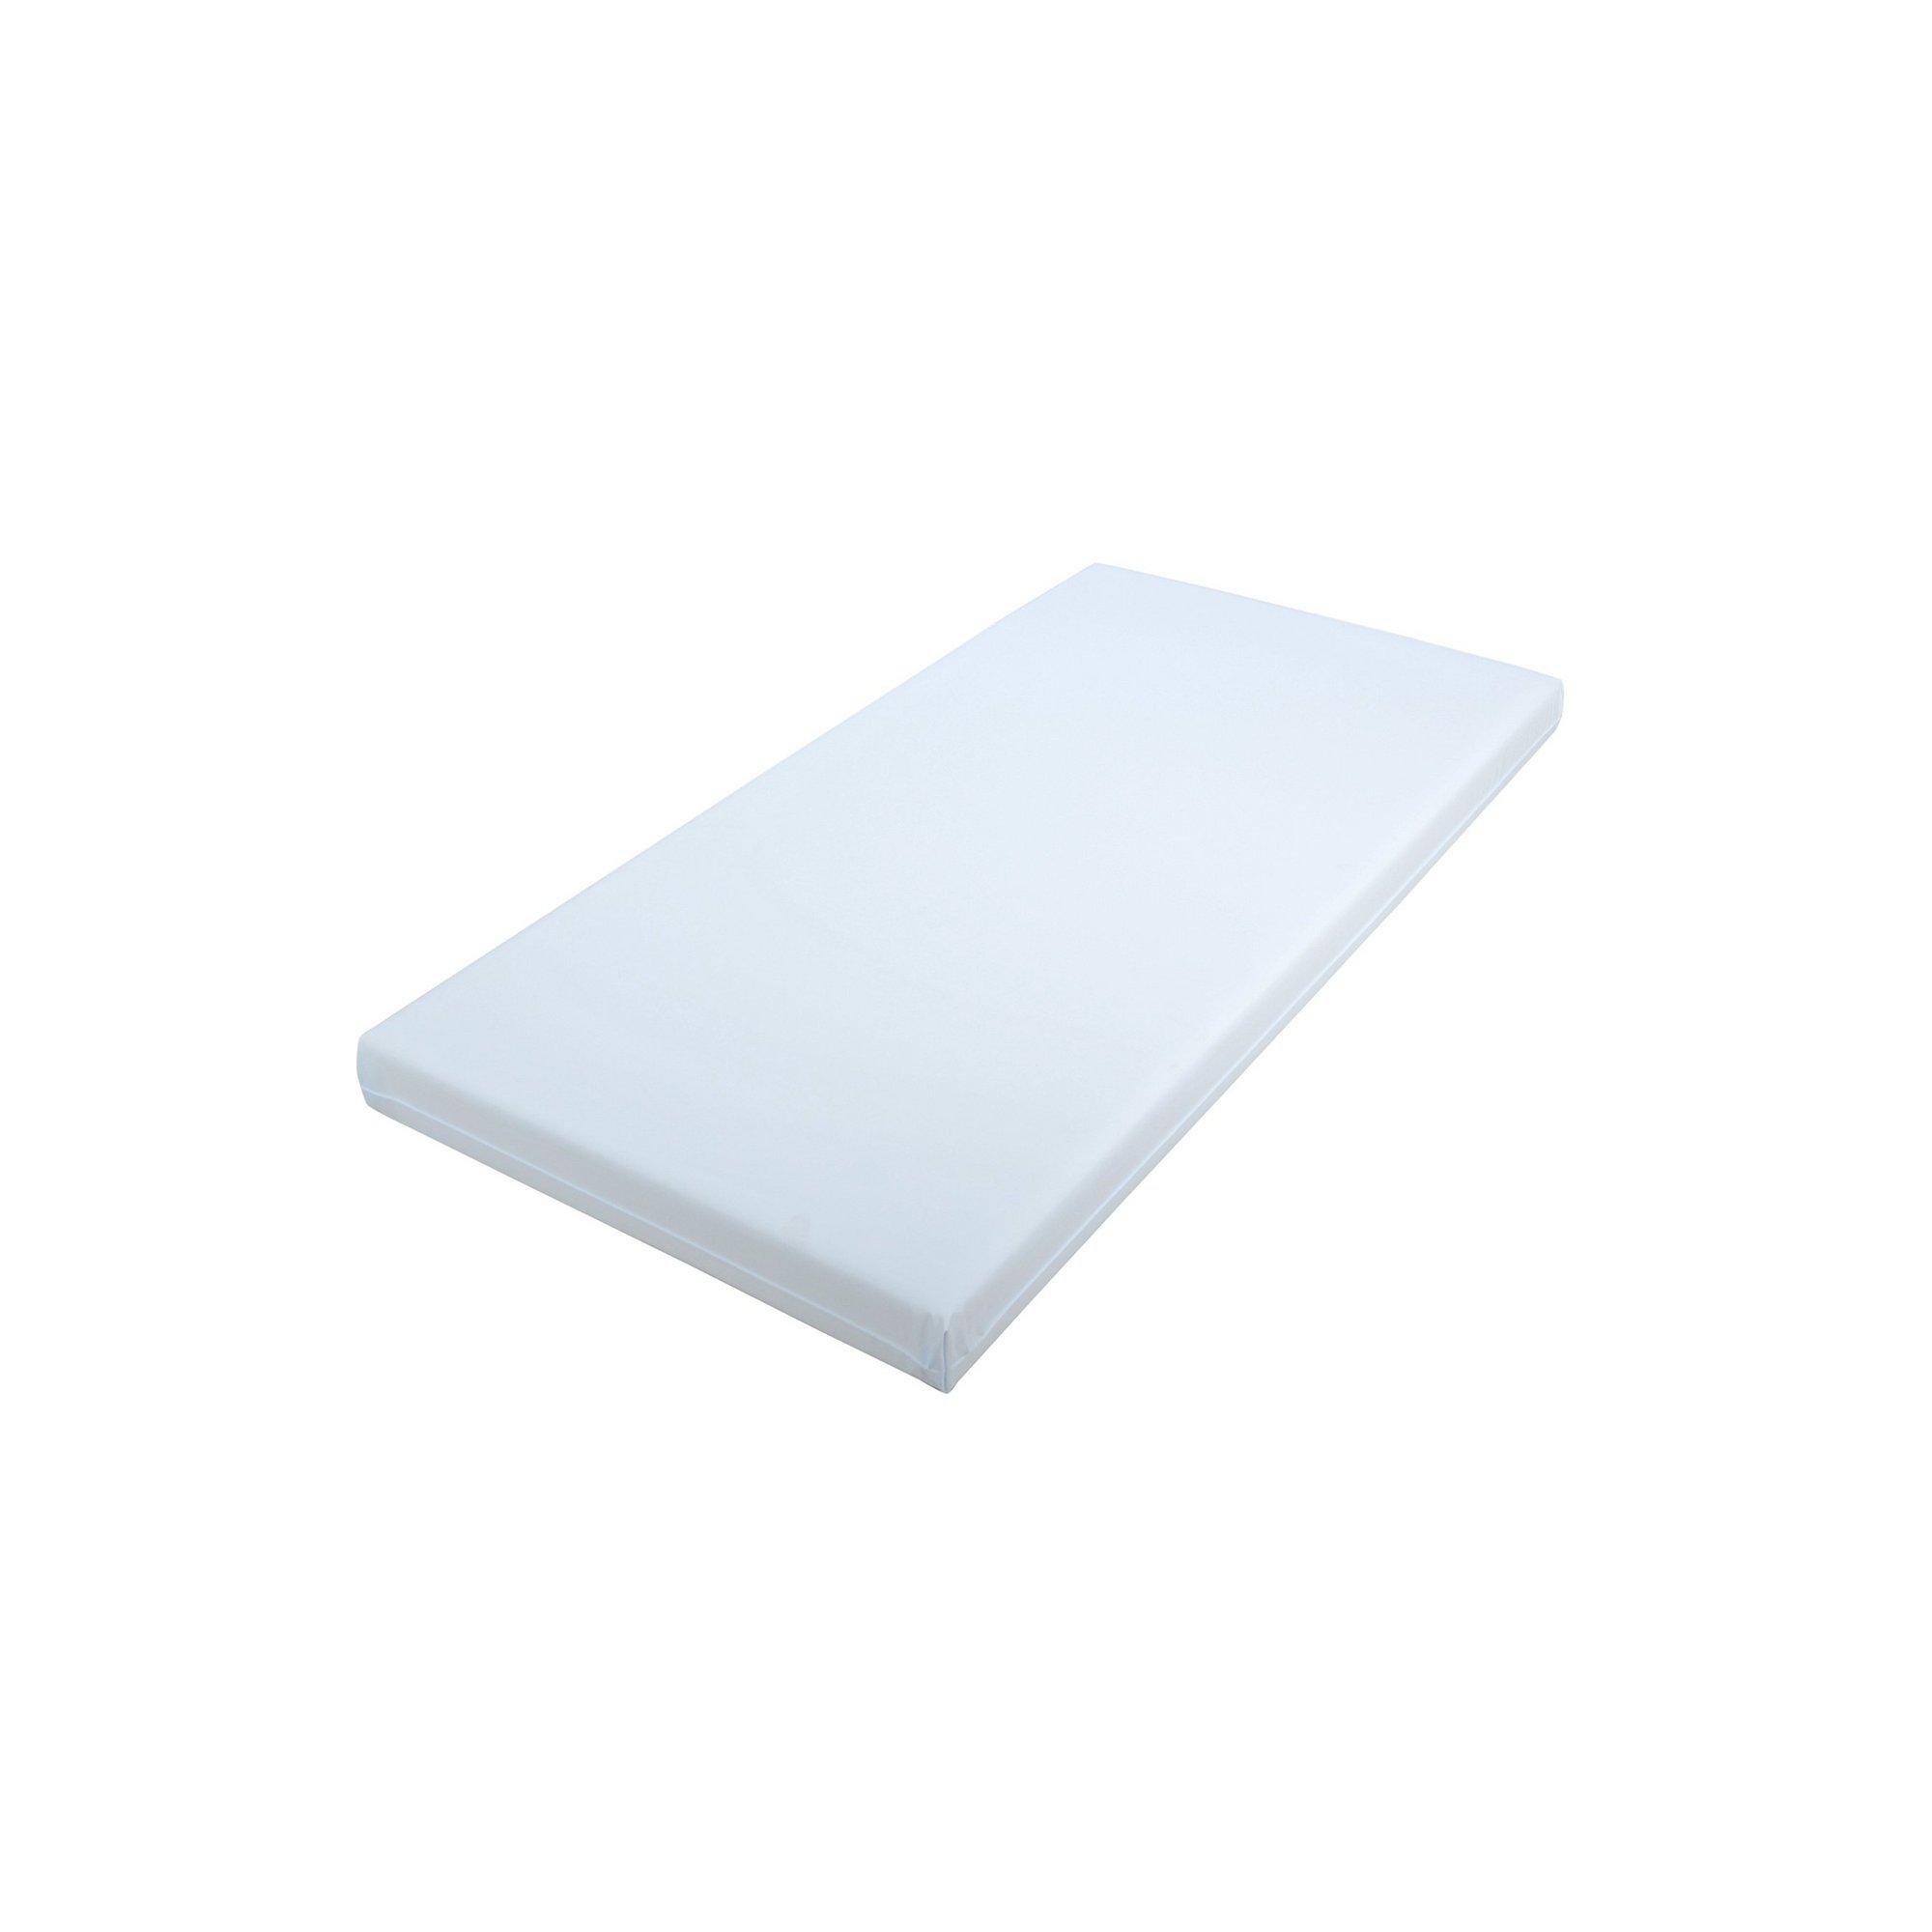 Image of Cotbed Foam Mattress